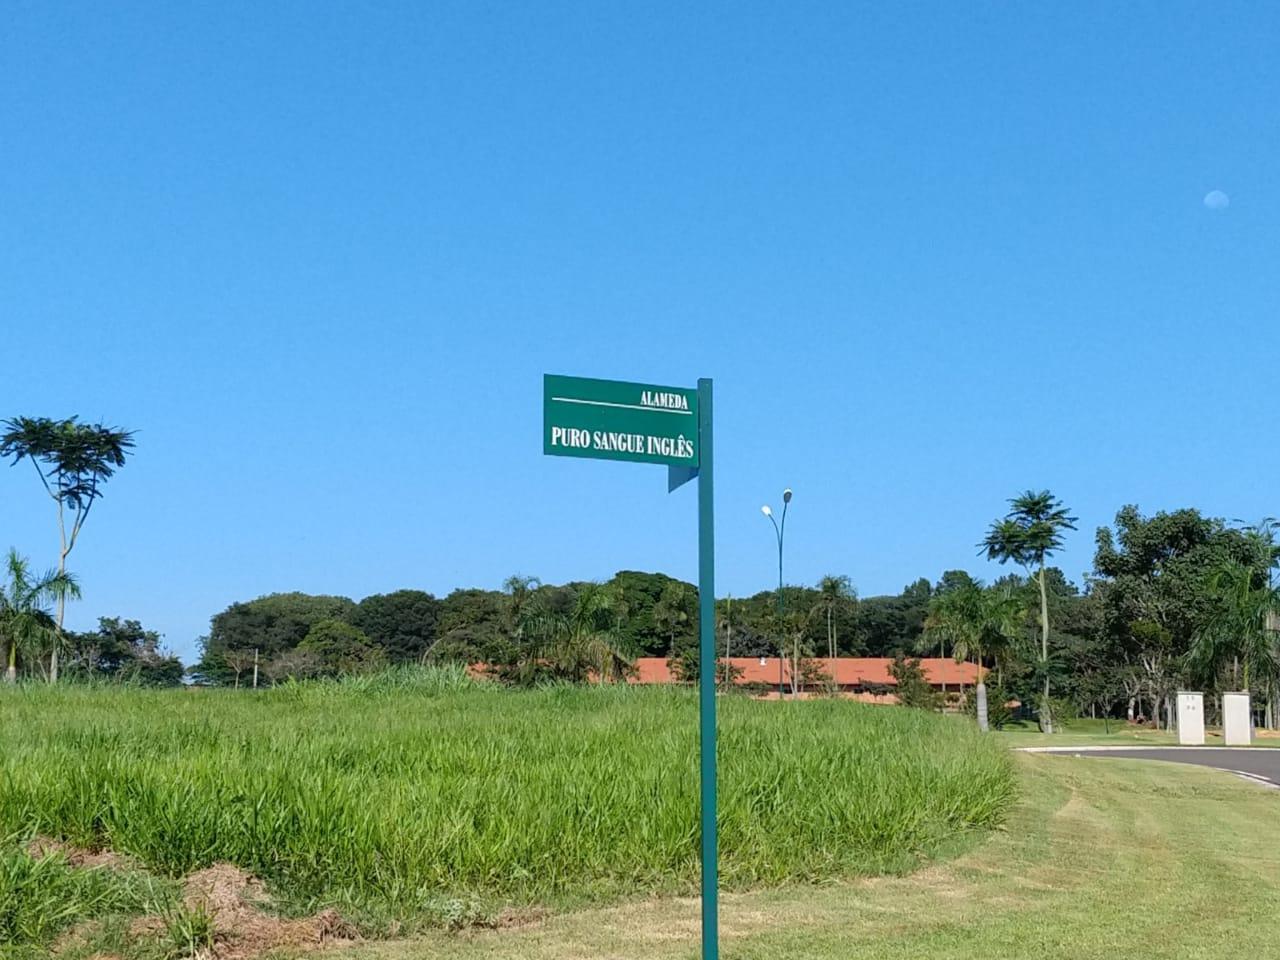 Terreno à venda, 800 m² por R$ 450.000 - Condomínio Haras Patente - Jaguariúna/SP